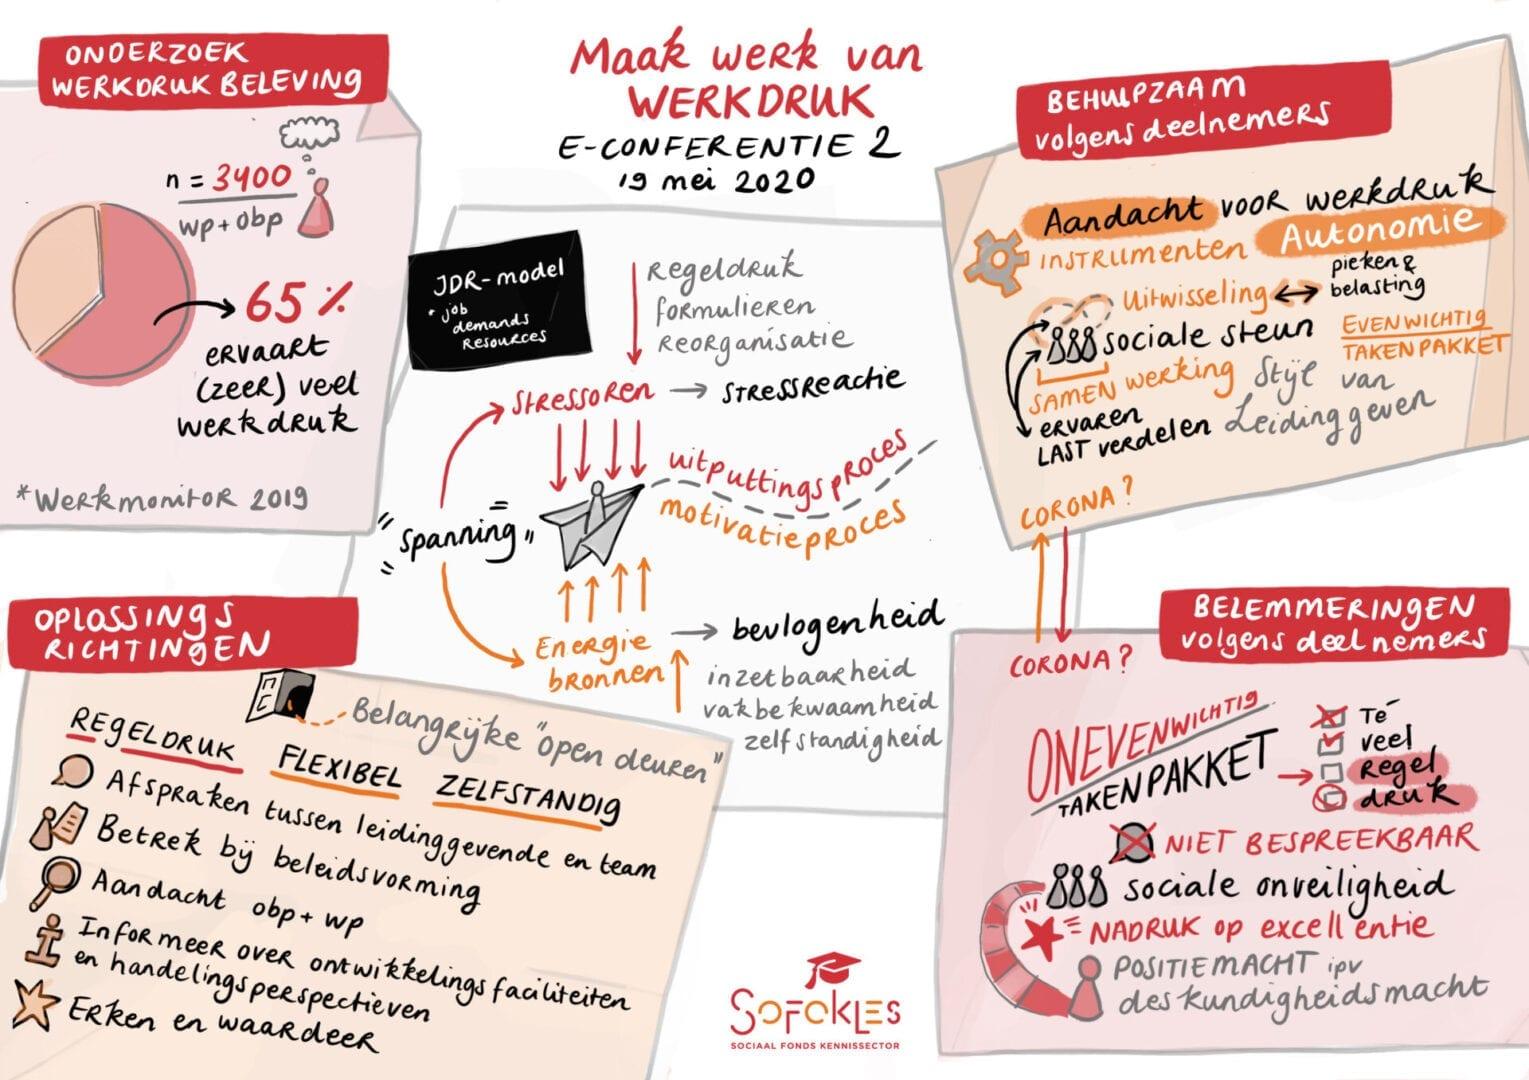 visueel verslag van de E Conferentie